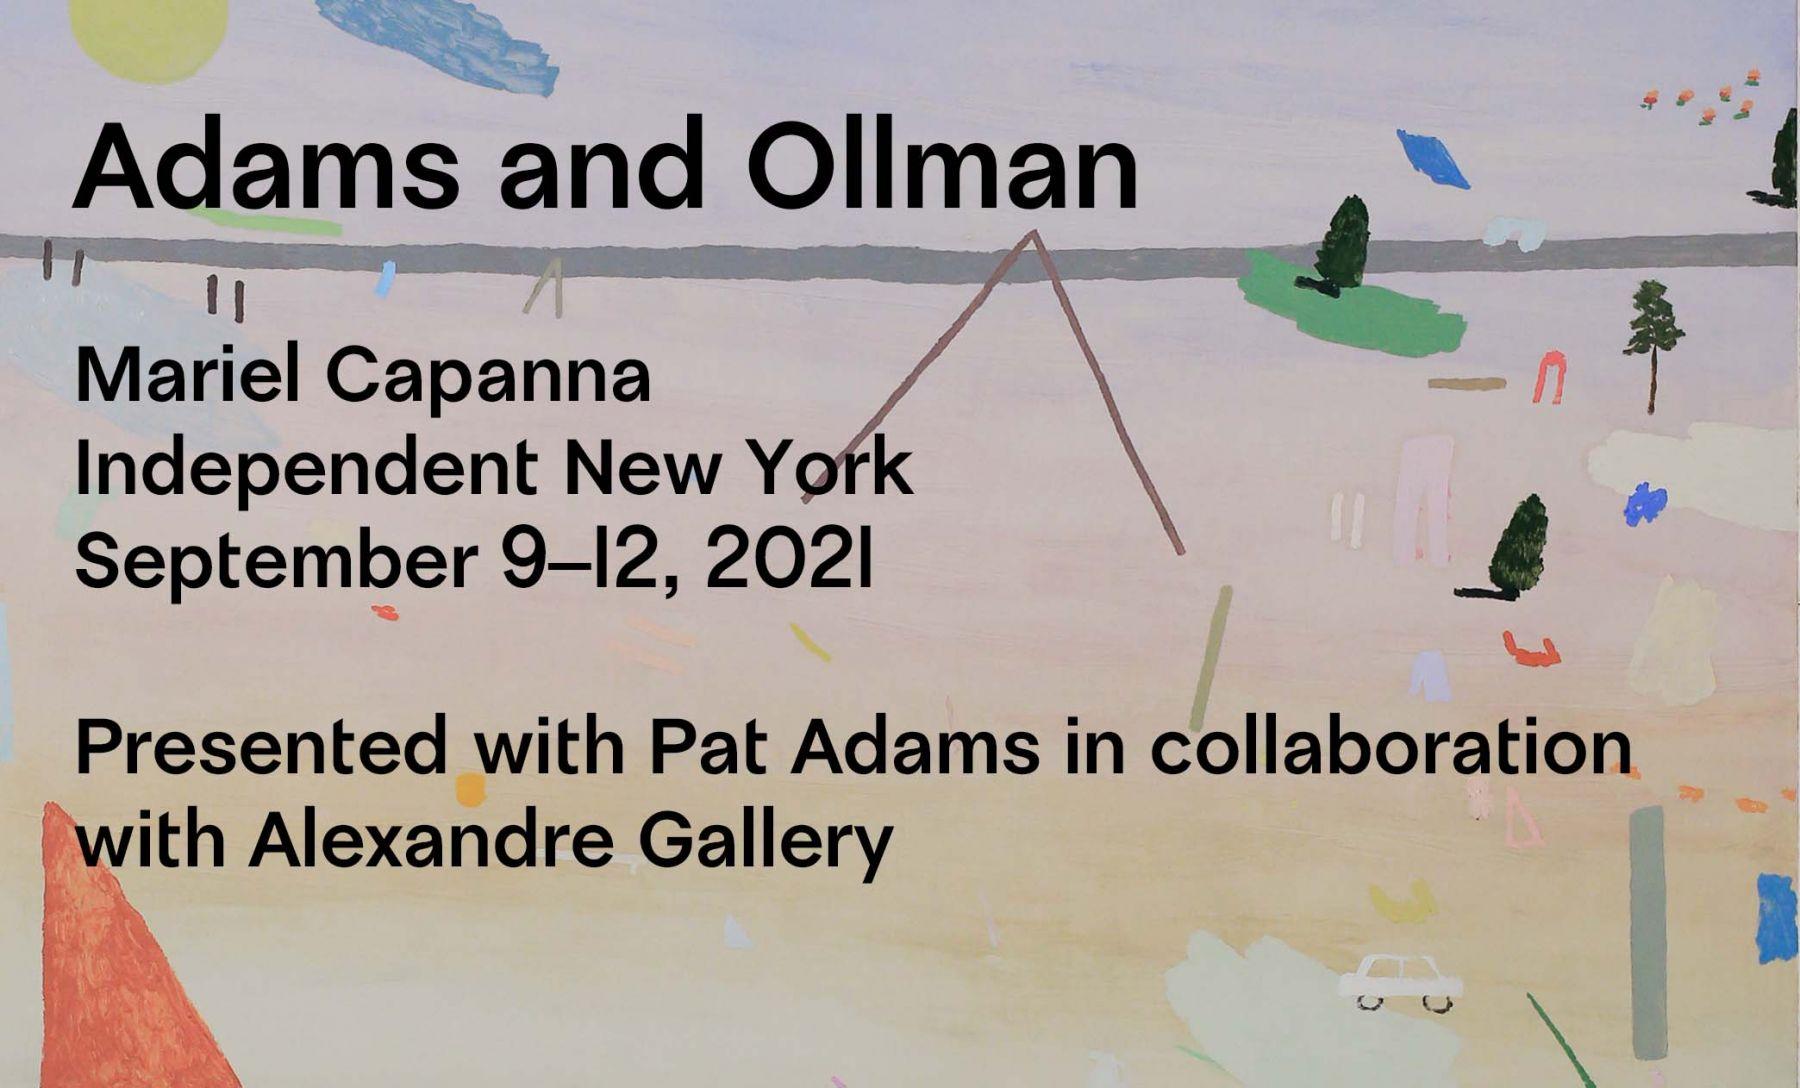 Mariel Capanna with Pat Adams at Independent New York